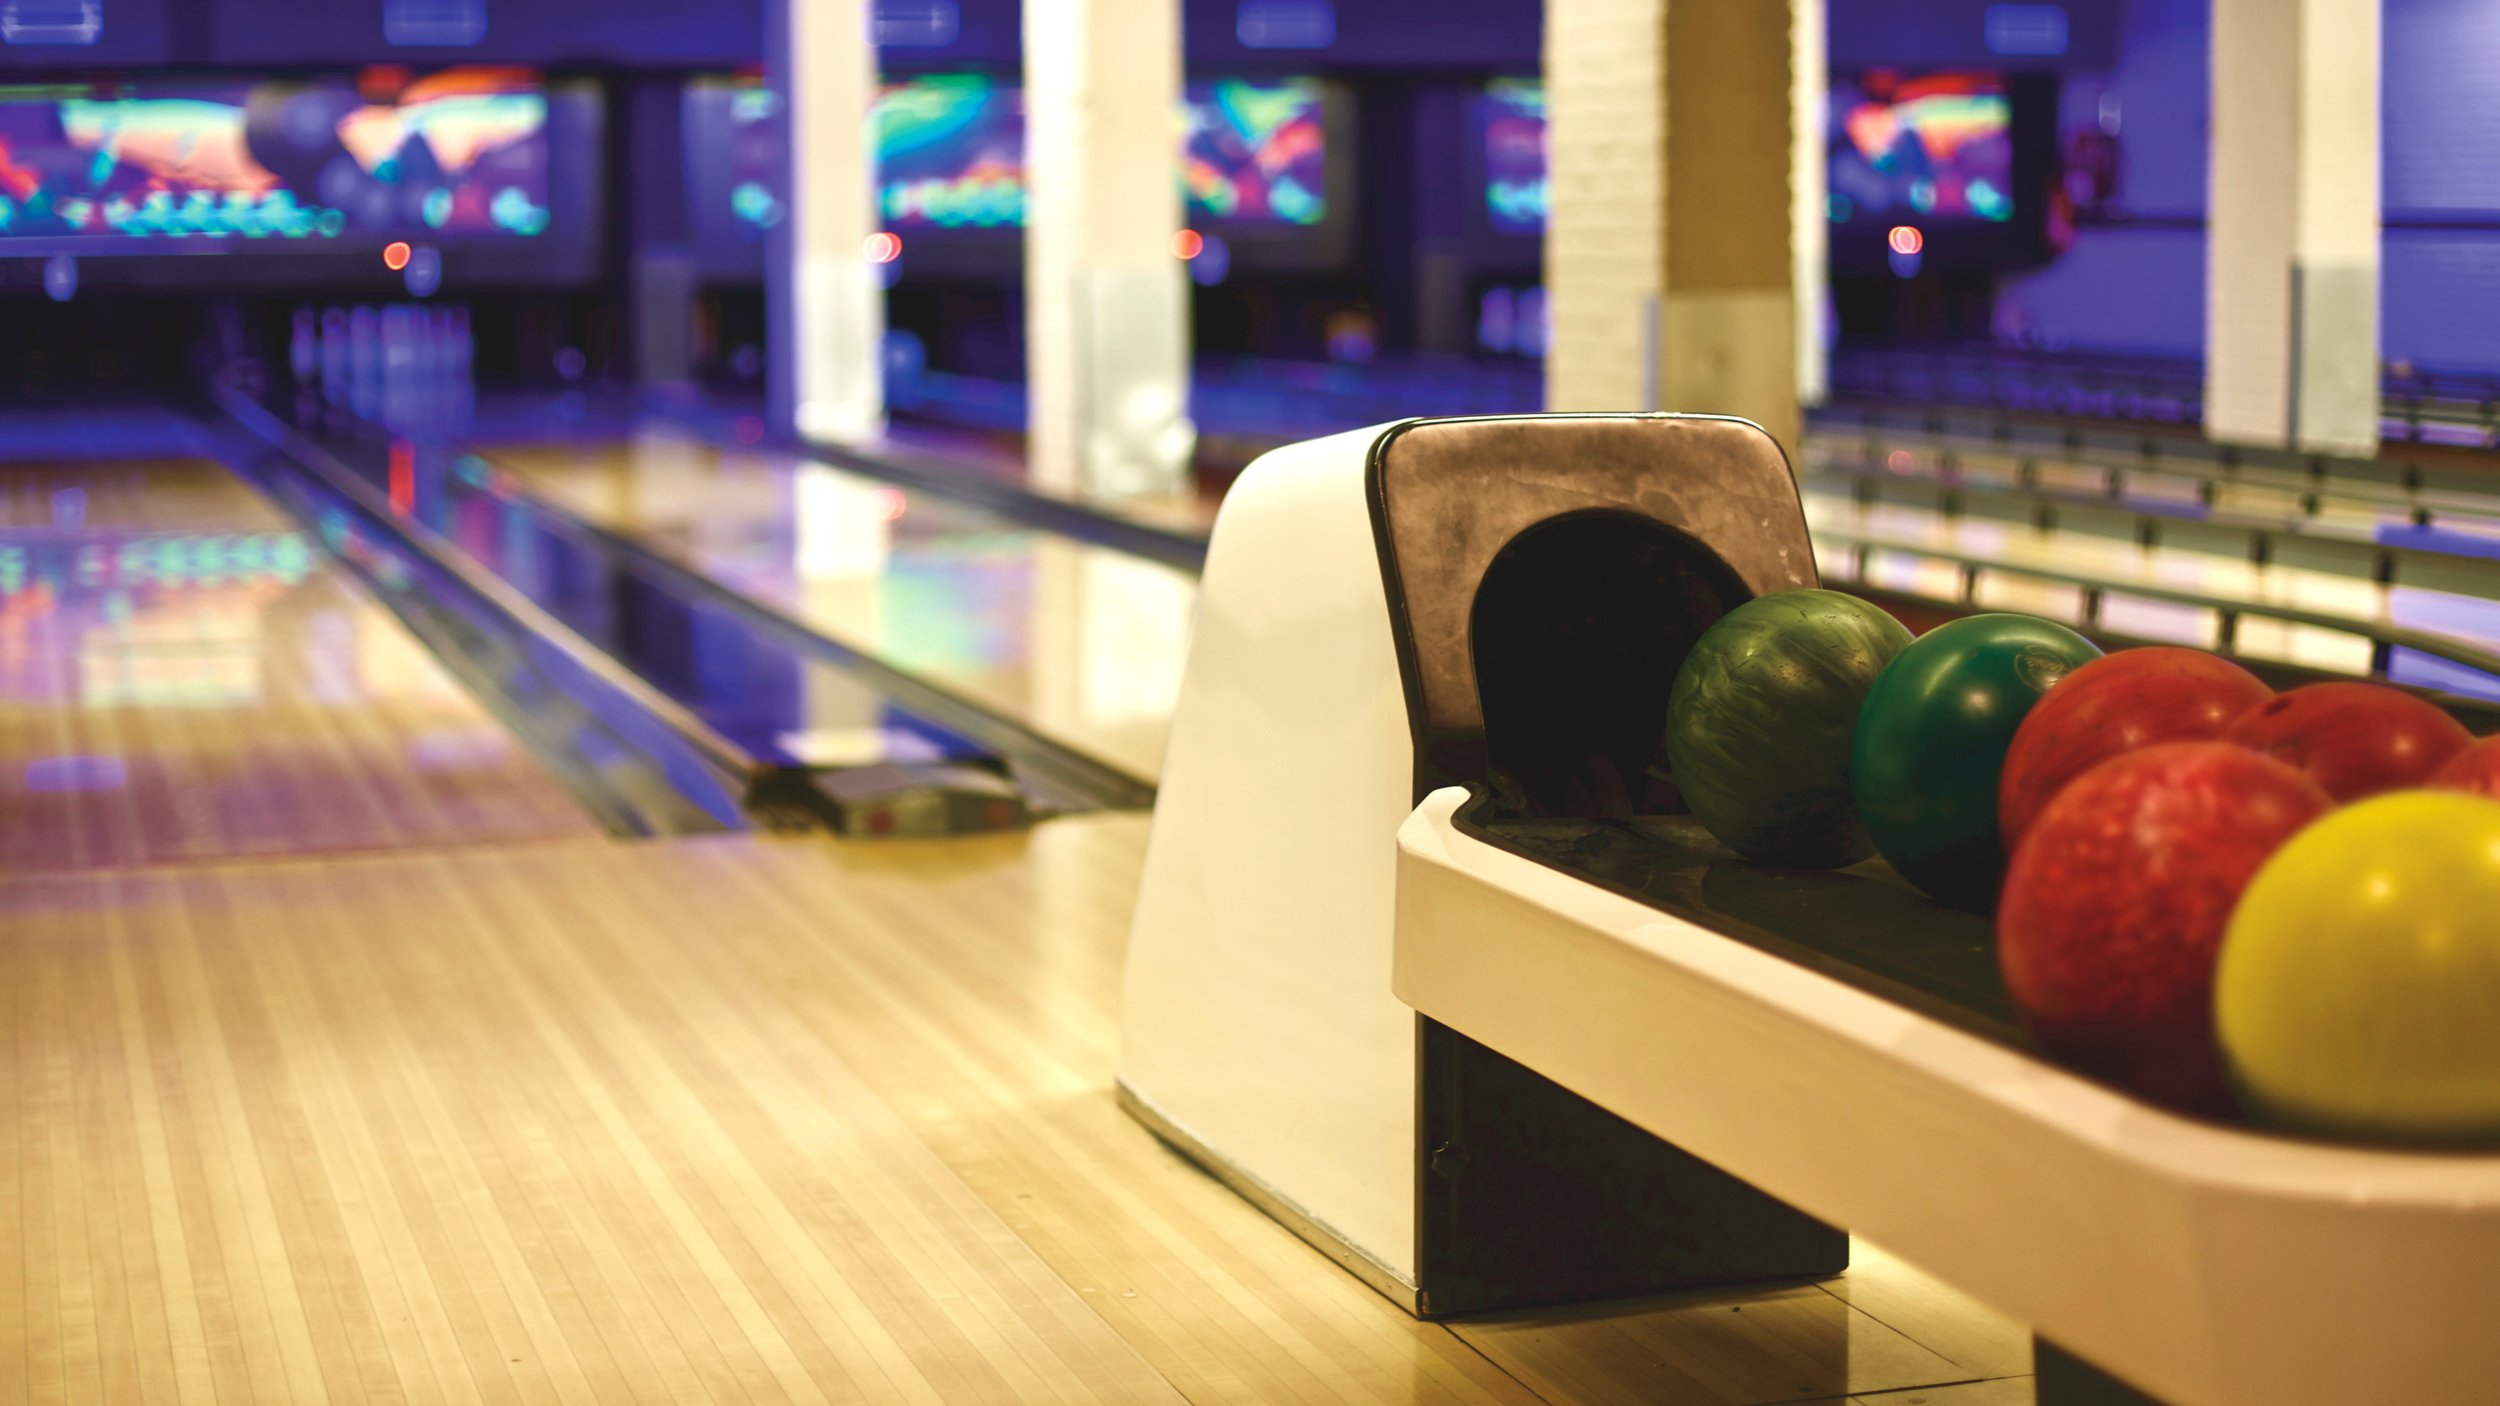 blur-bowling-bowling-alley-344034.jpg